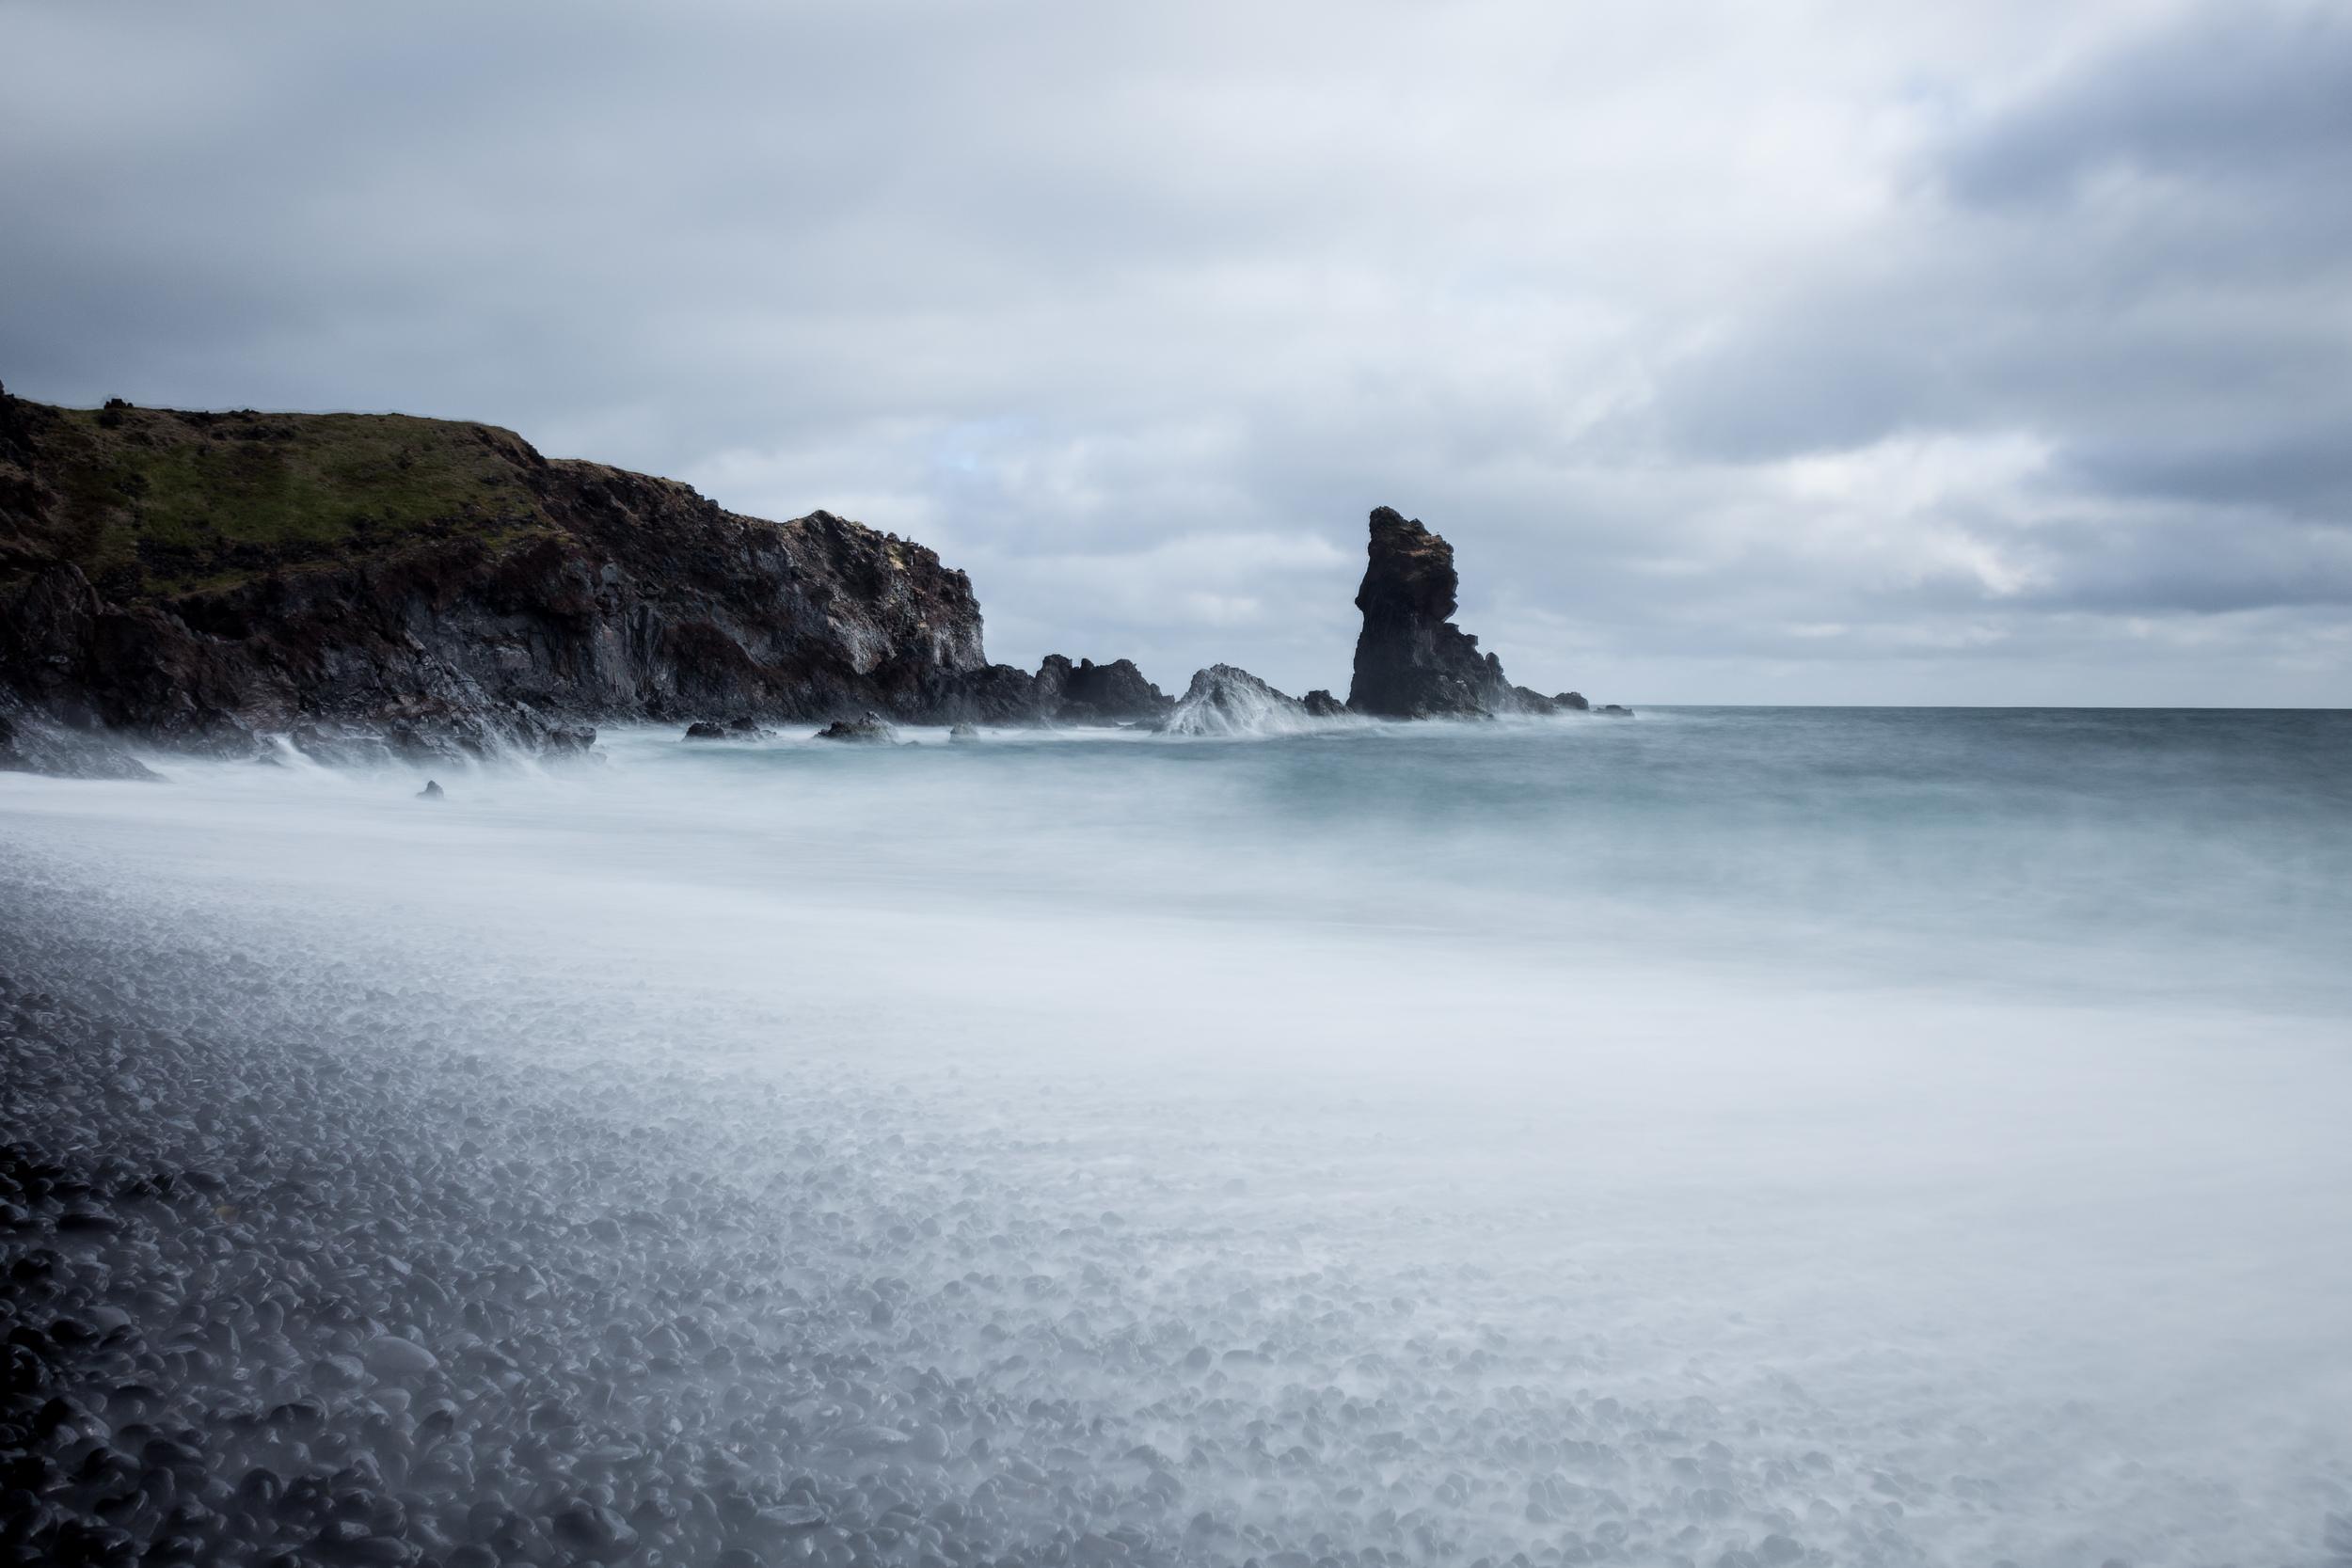 Gossamer waves washing over the pebbles